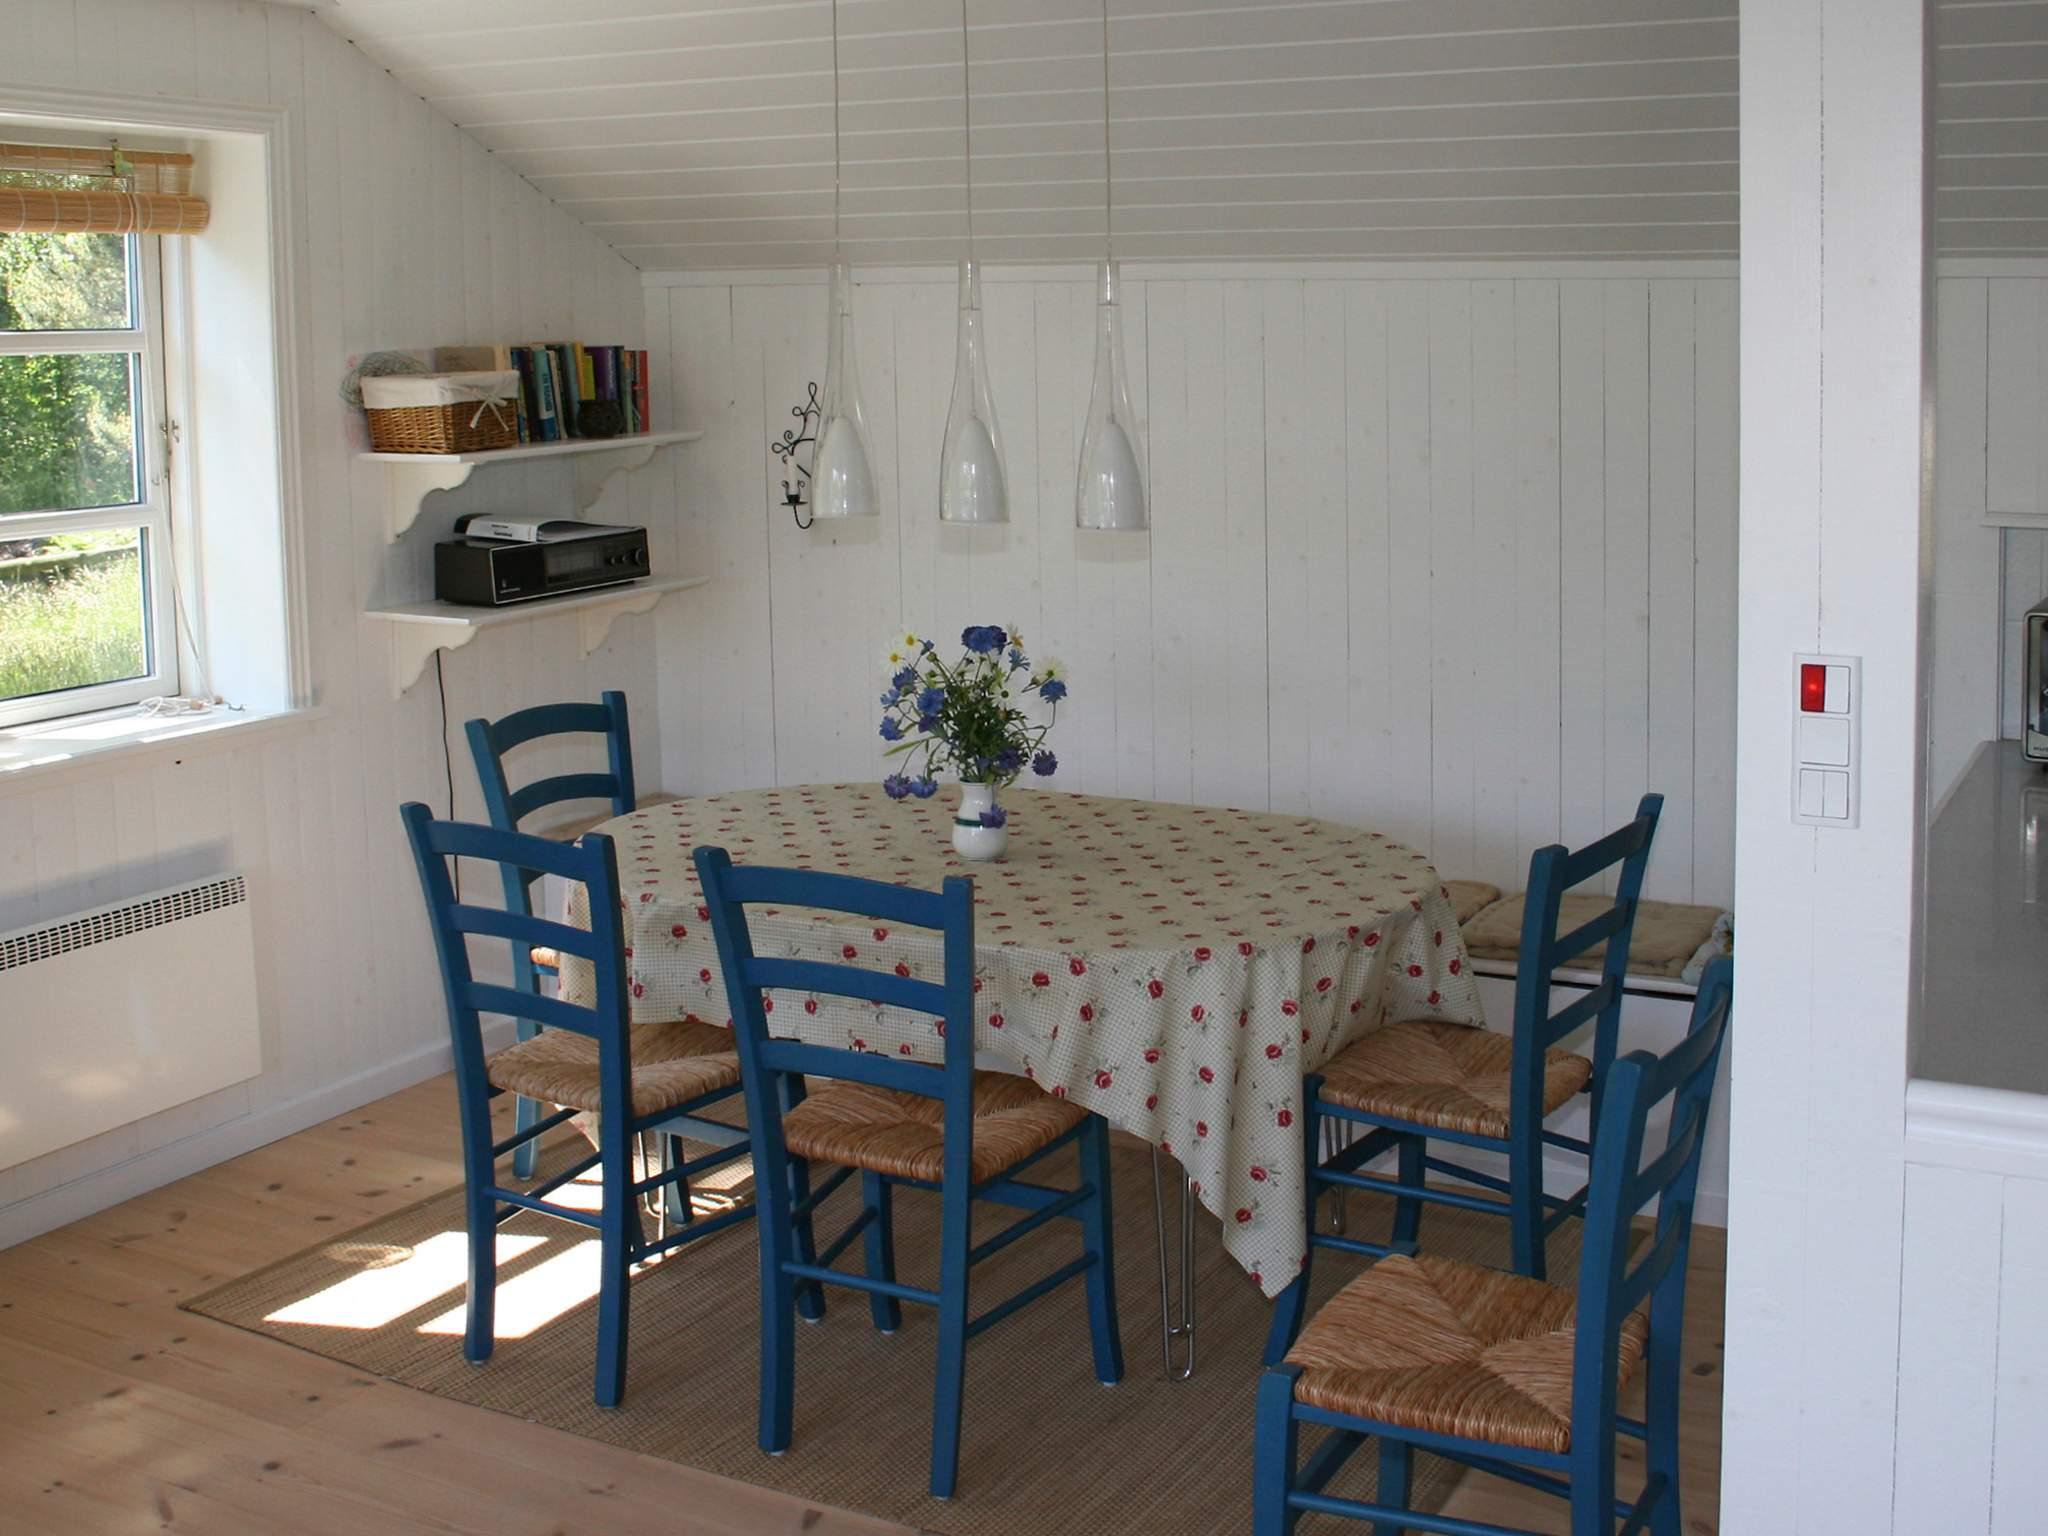 Ferienhaus Balka Strand (82298), Balke, , Bornholm, Dänemark, Bild 4